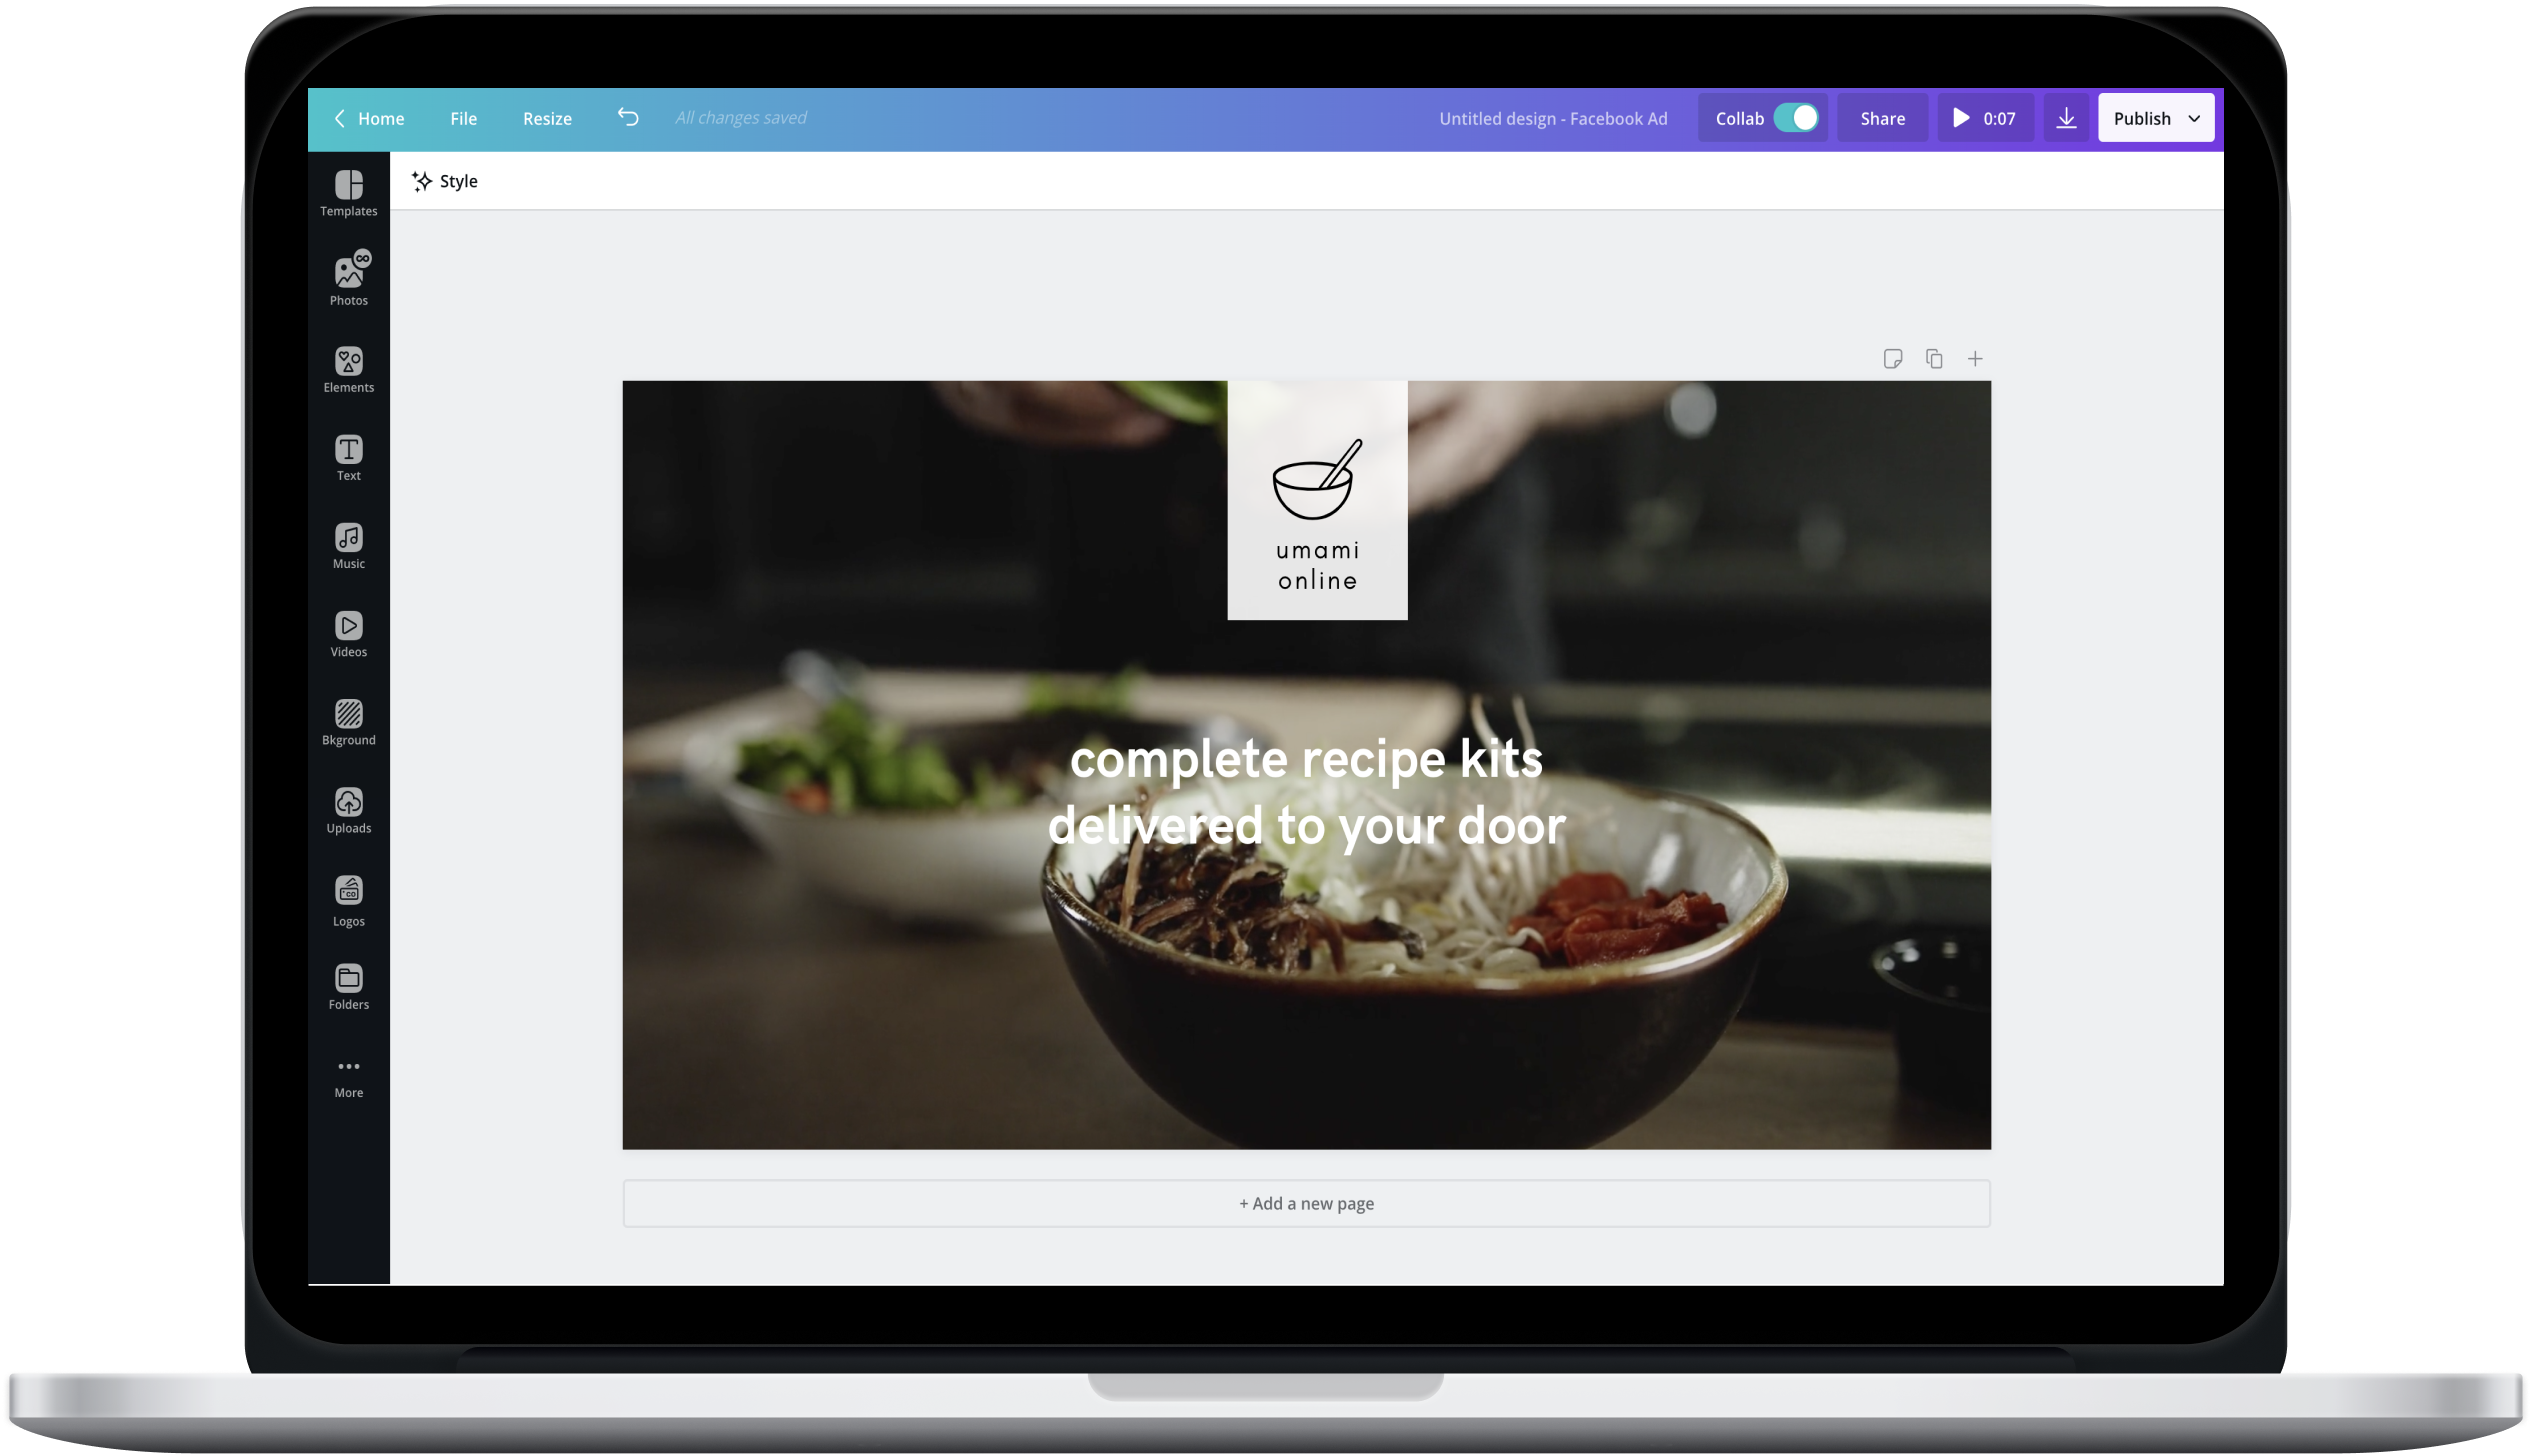 Canva editor showing a recipe kit Facebook ad design